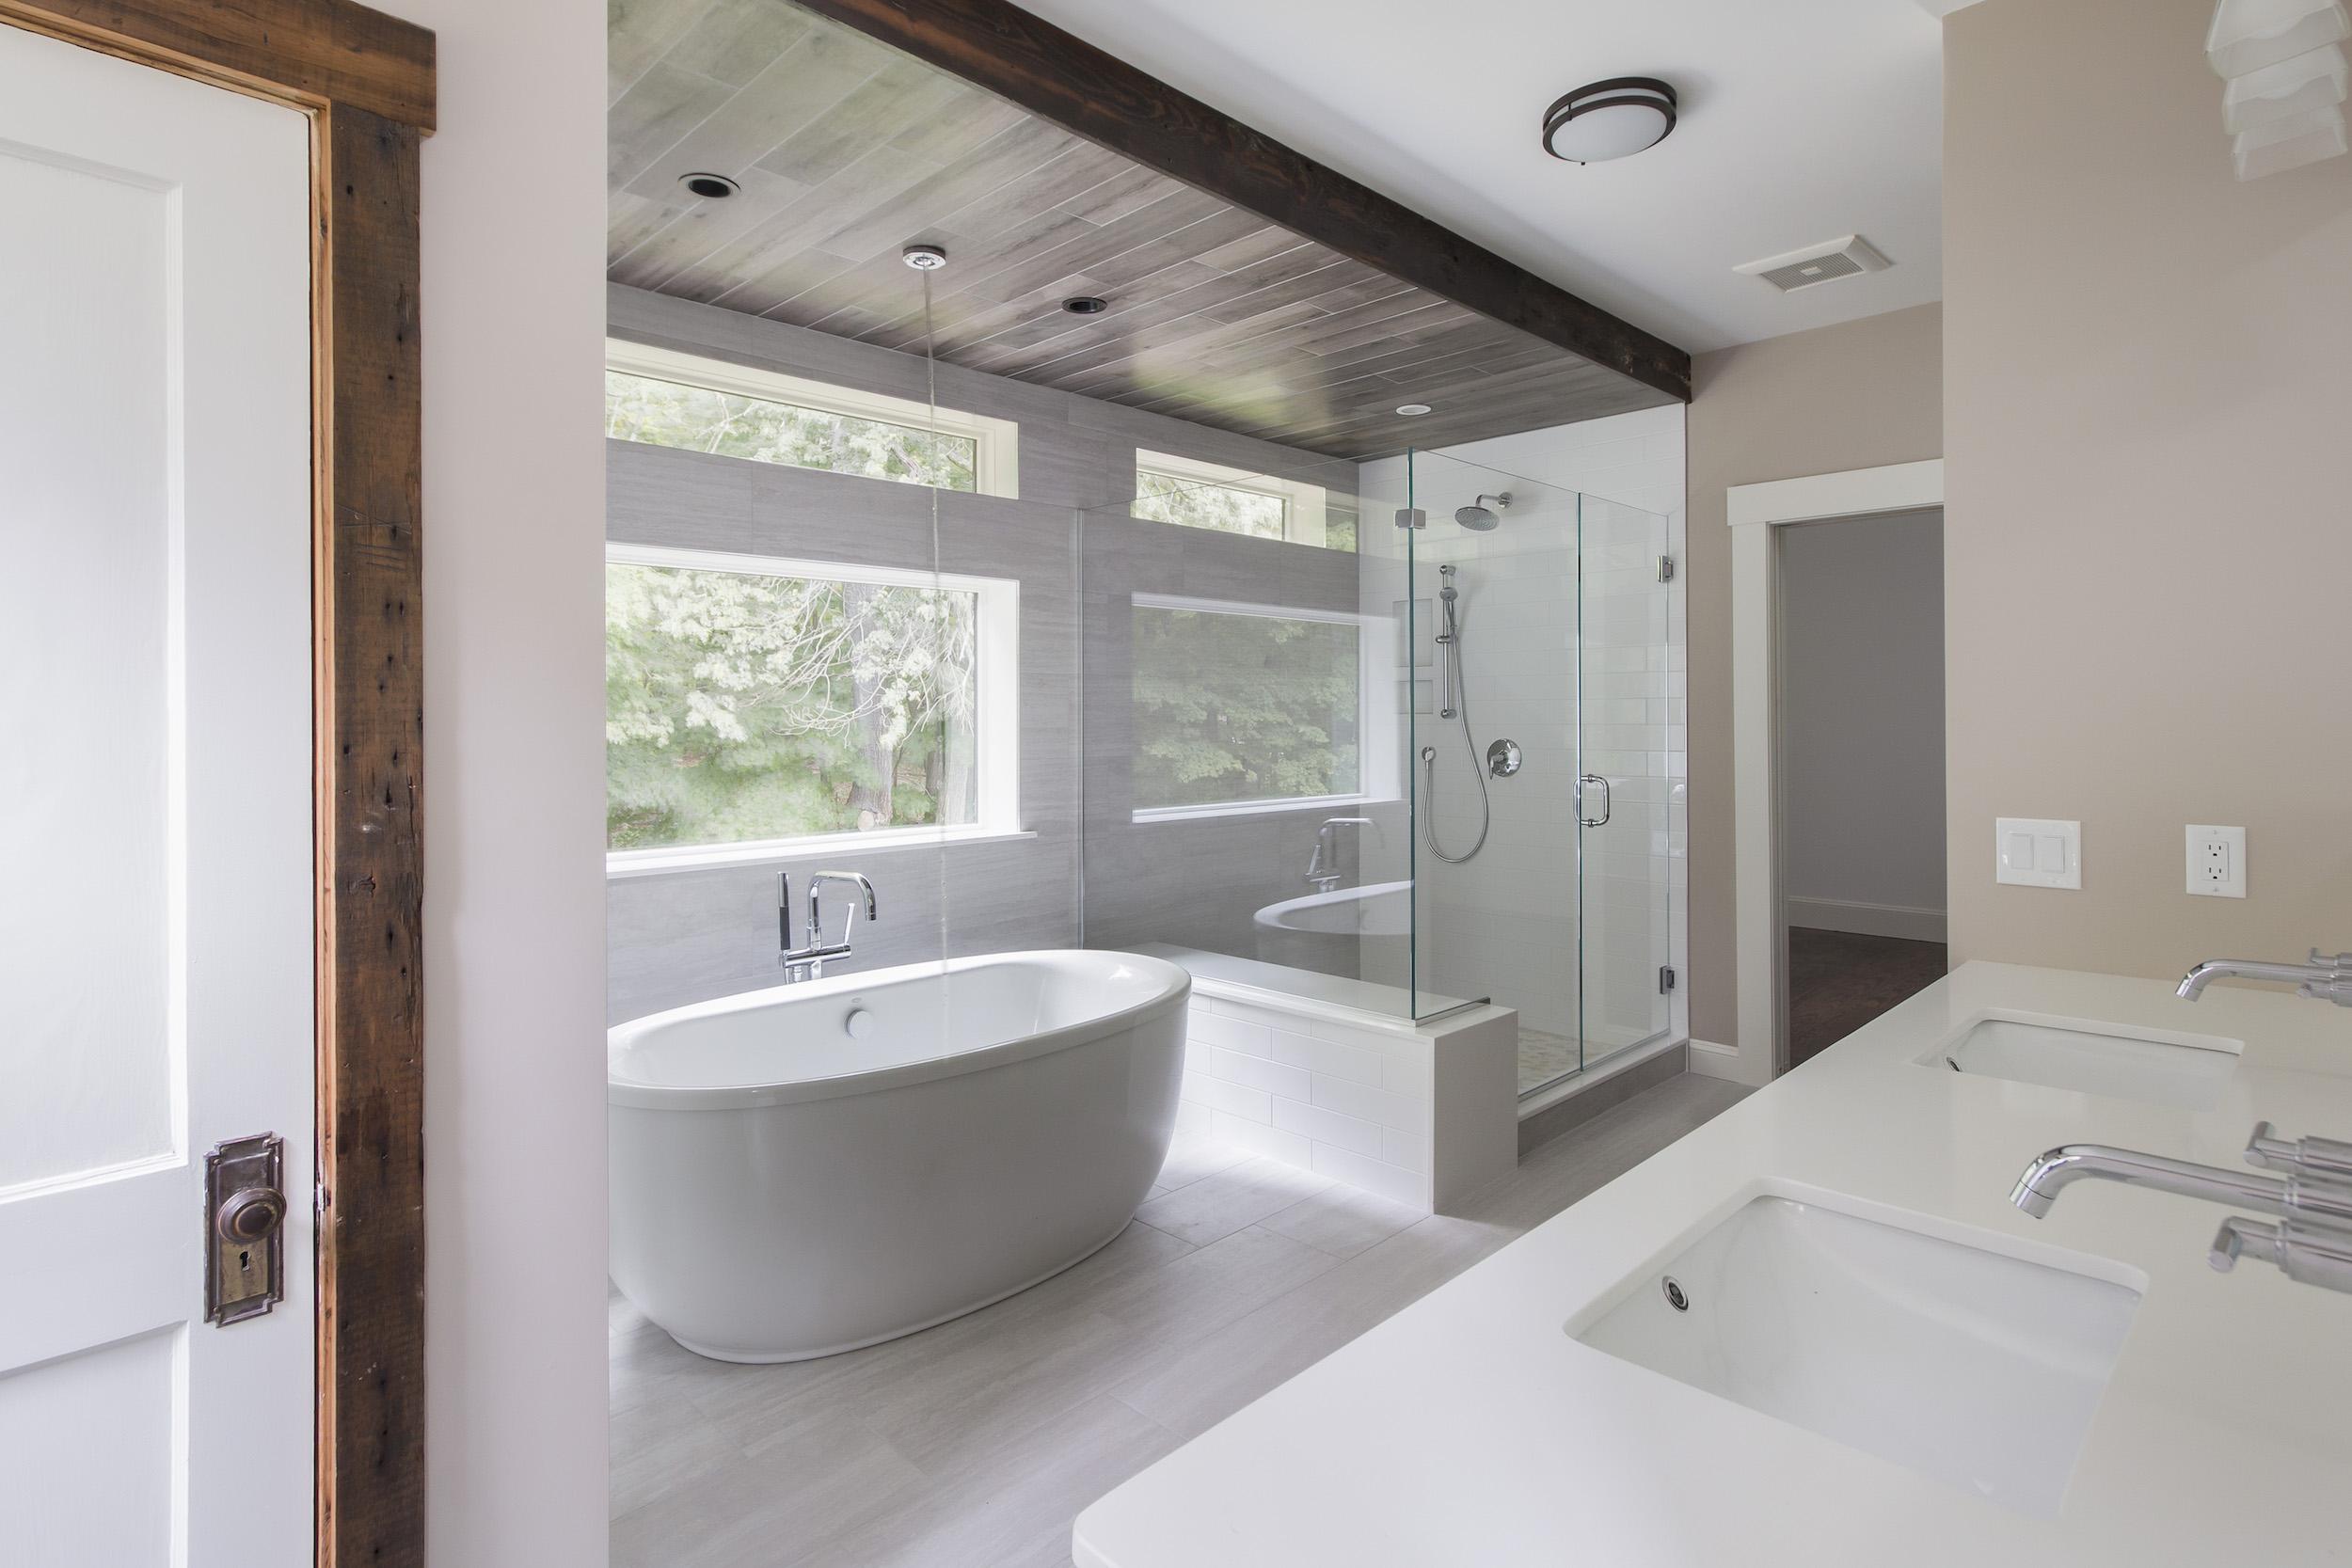 1-KitchenVisions-Master-Baths-Sherborn-1.jpg